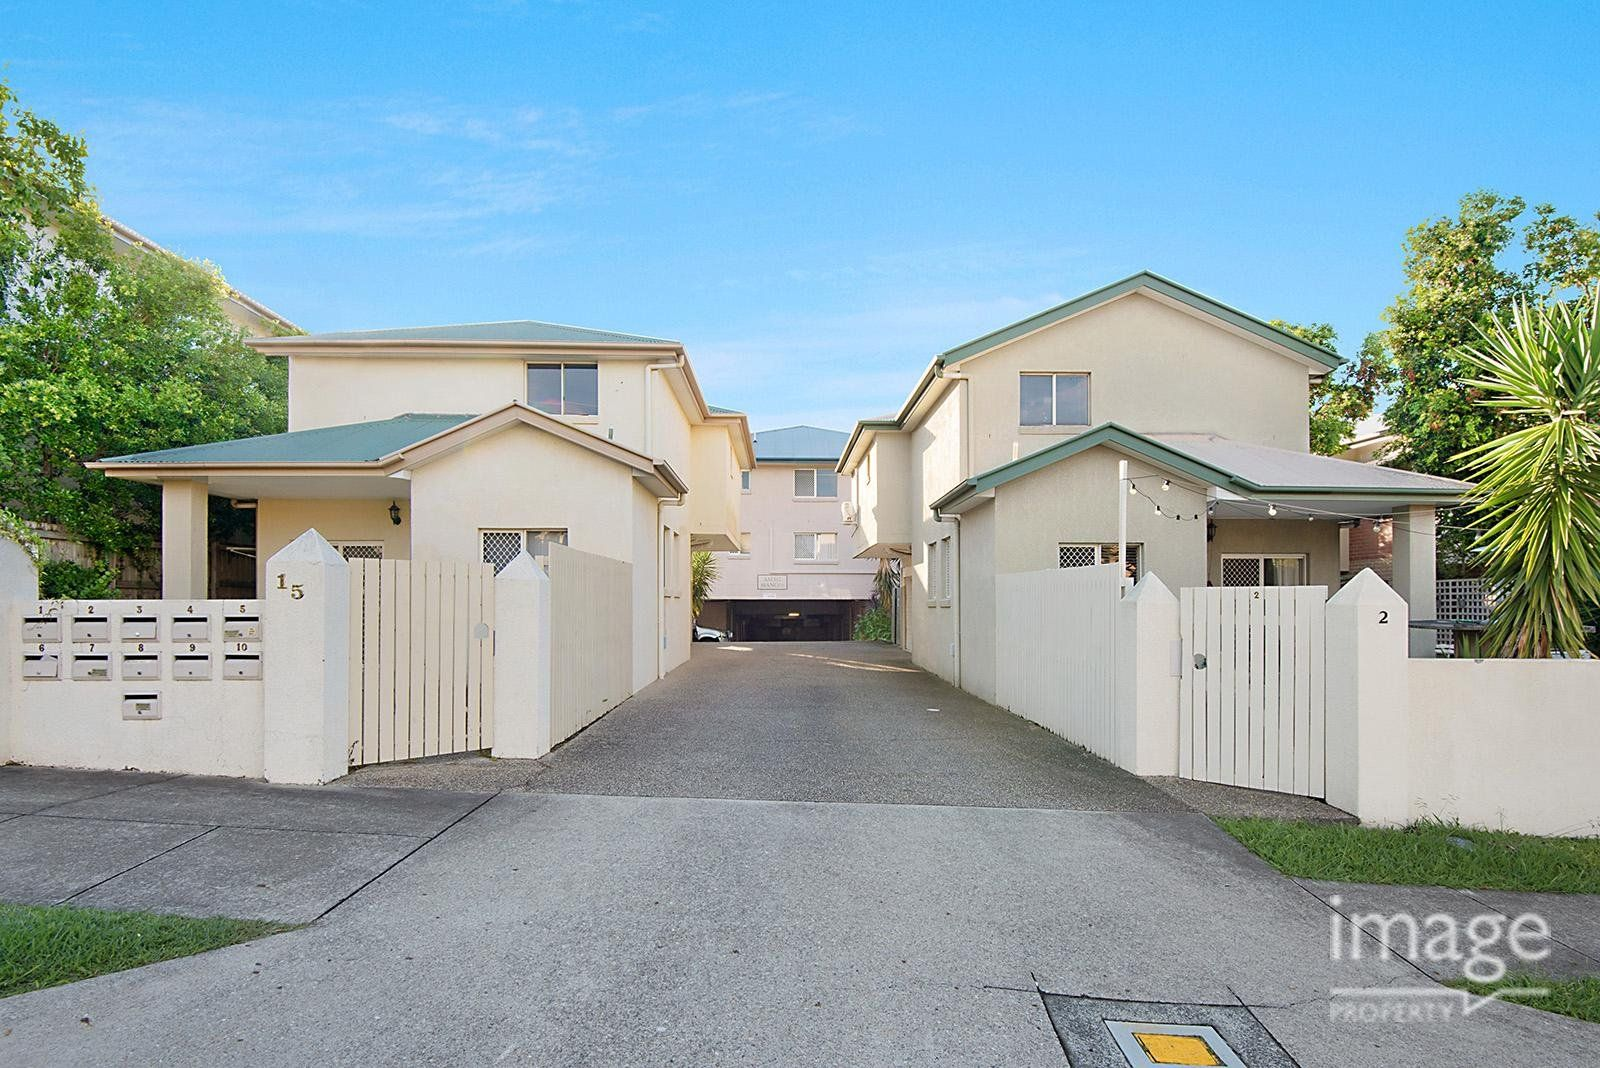 15 Cardross Street, Yeerongpilly QLD 4105, Image 7